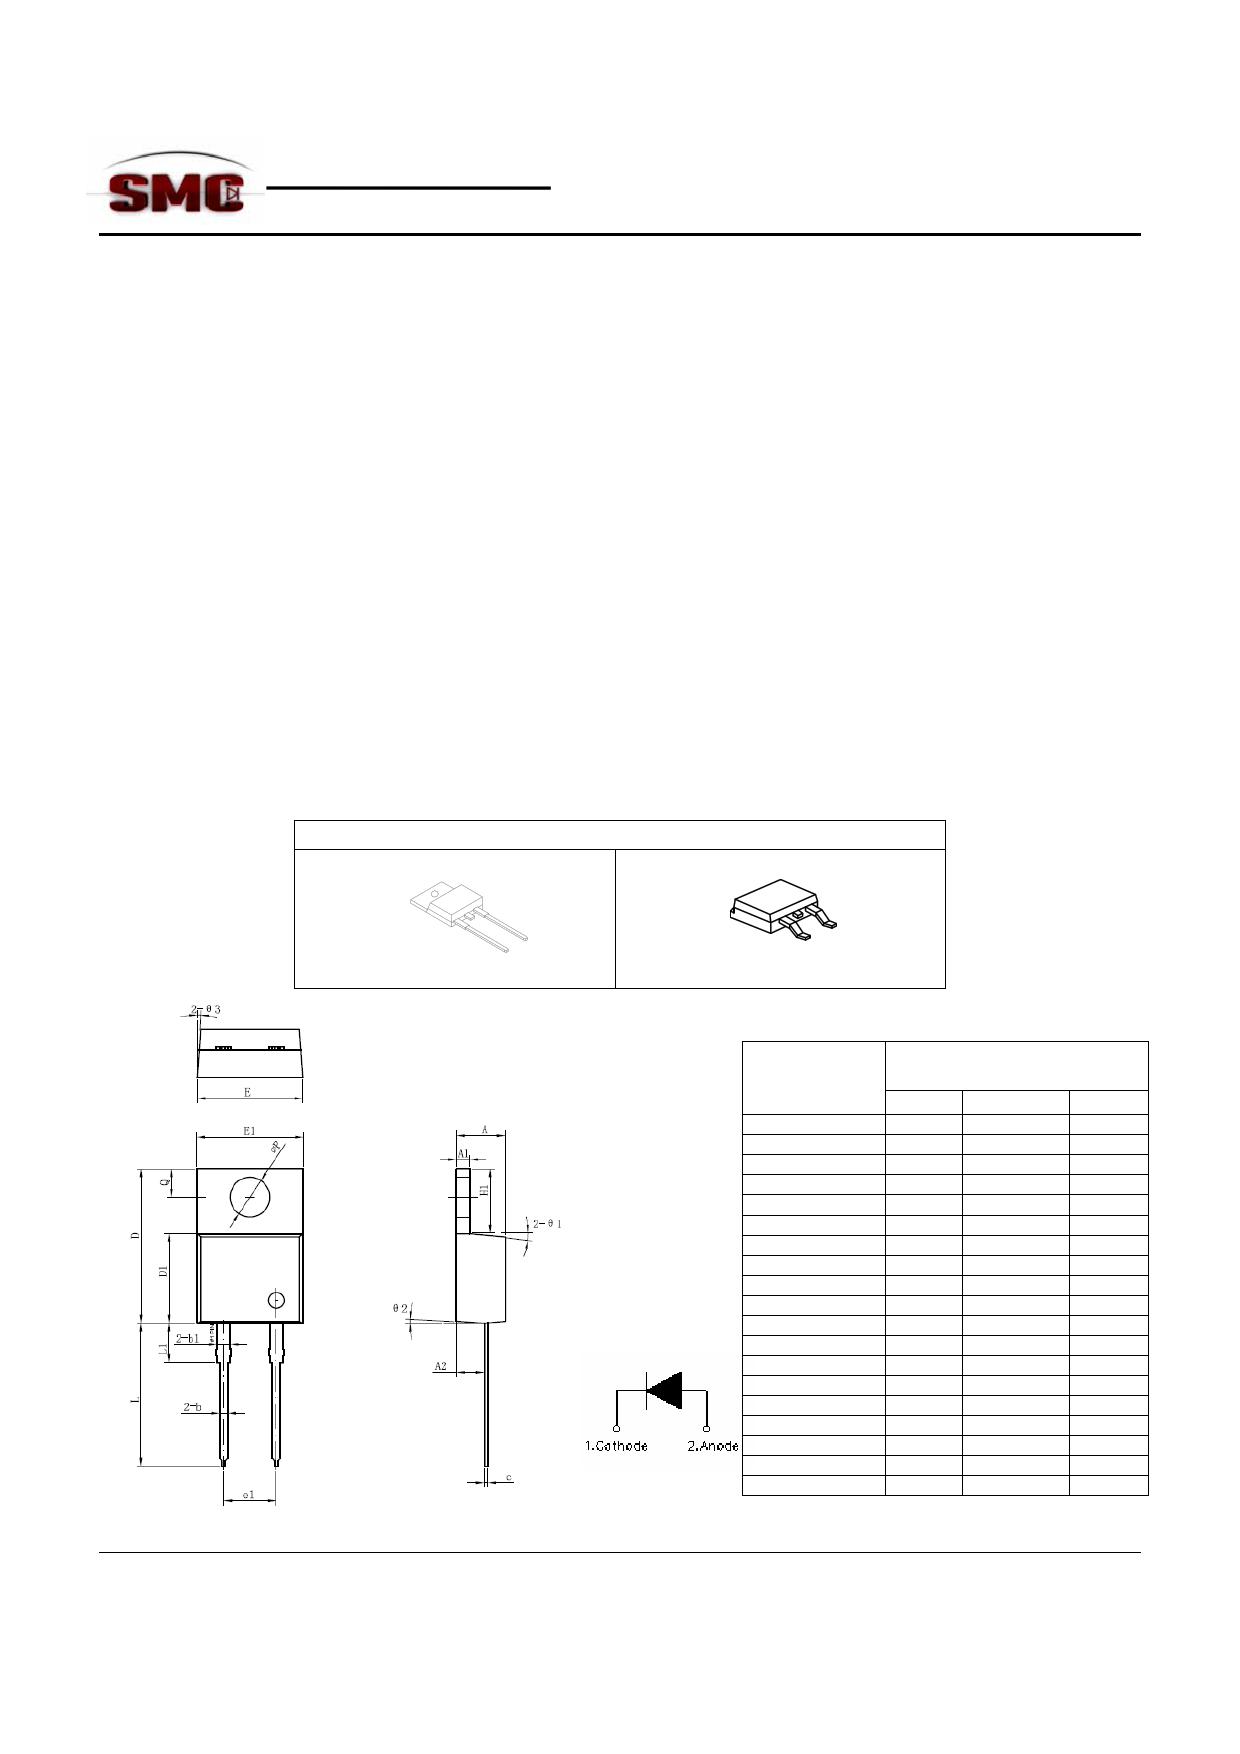 10TQ035S Datasheet, 10TQ035S PDF,ピン配置, 機能